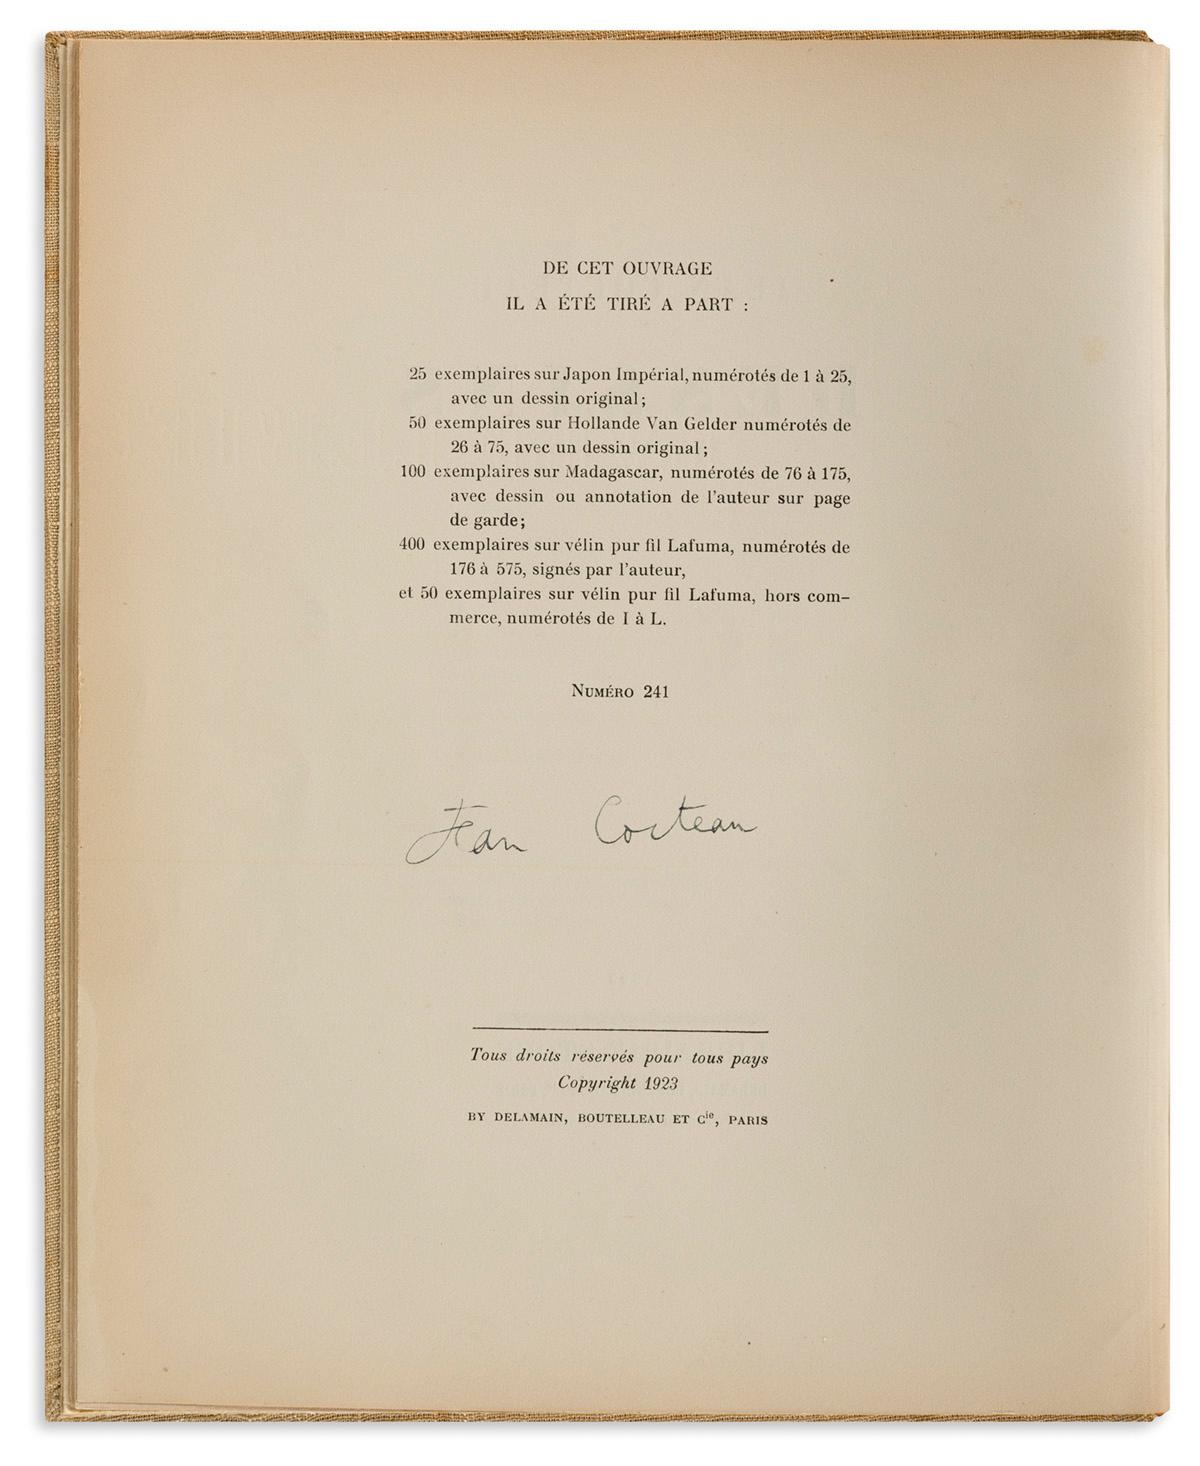 JEAN-COCTEAU-(1889-1963)-Dessins